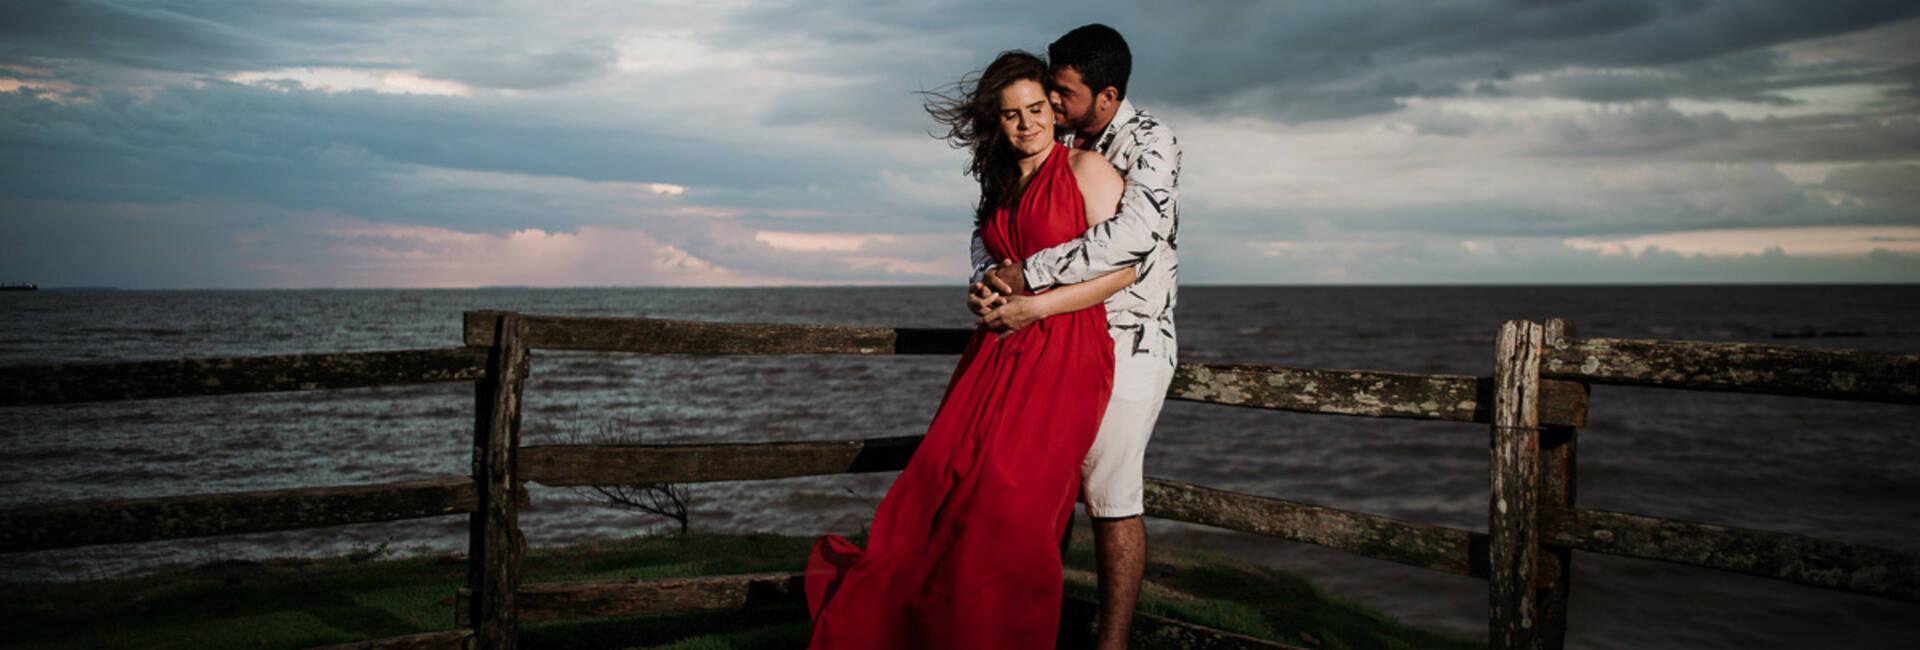 ENSAIO PRE WEDDING de JÉSSICA E WEVERTON